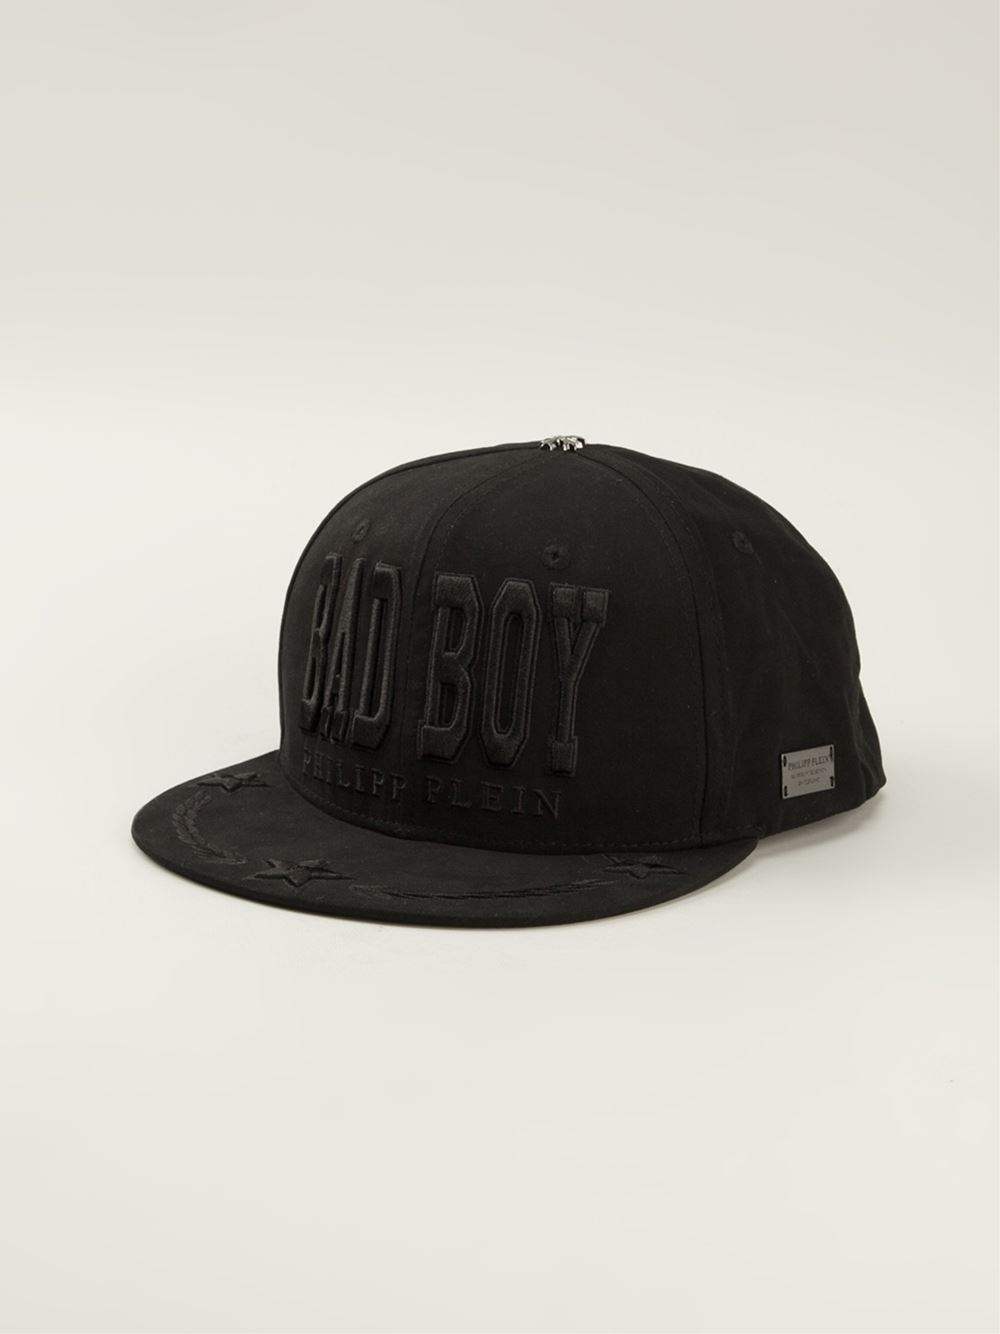 philipp plein bad boy cap in black for men lyst. Black Bedroom Furniture Sets. Home Design Ideas